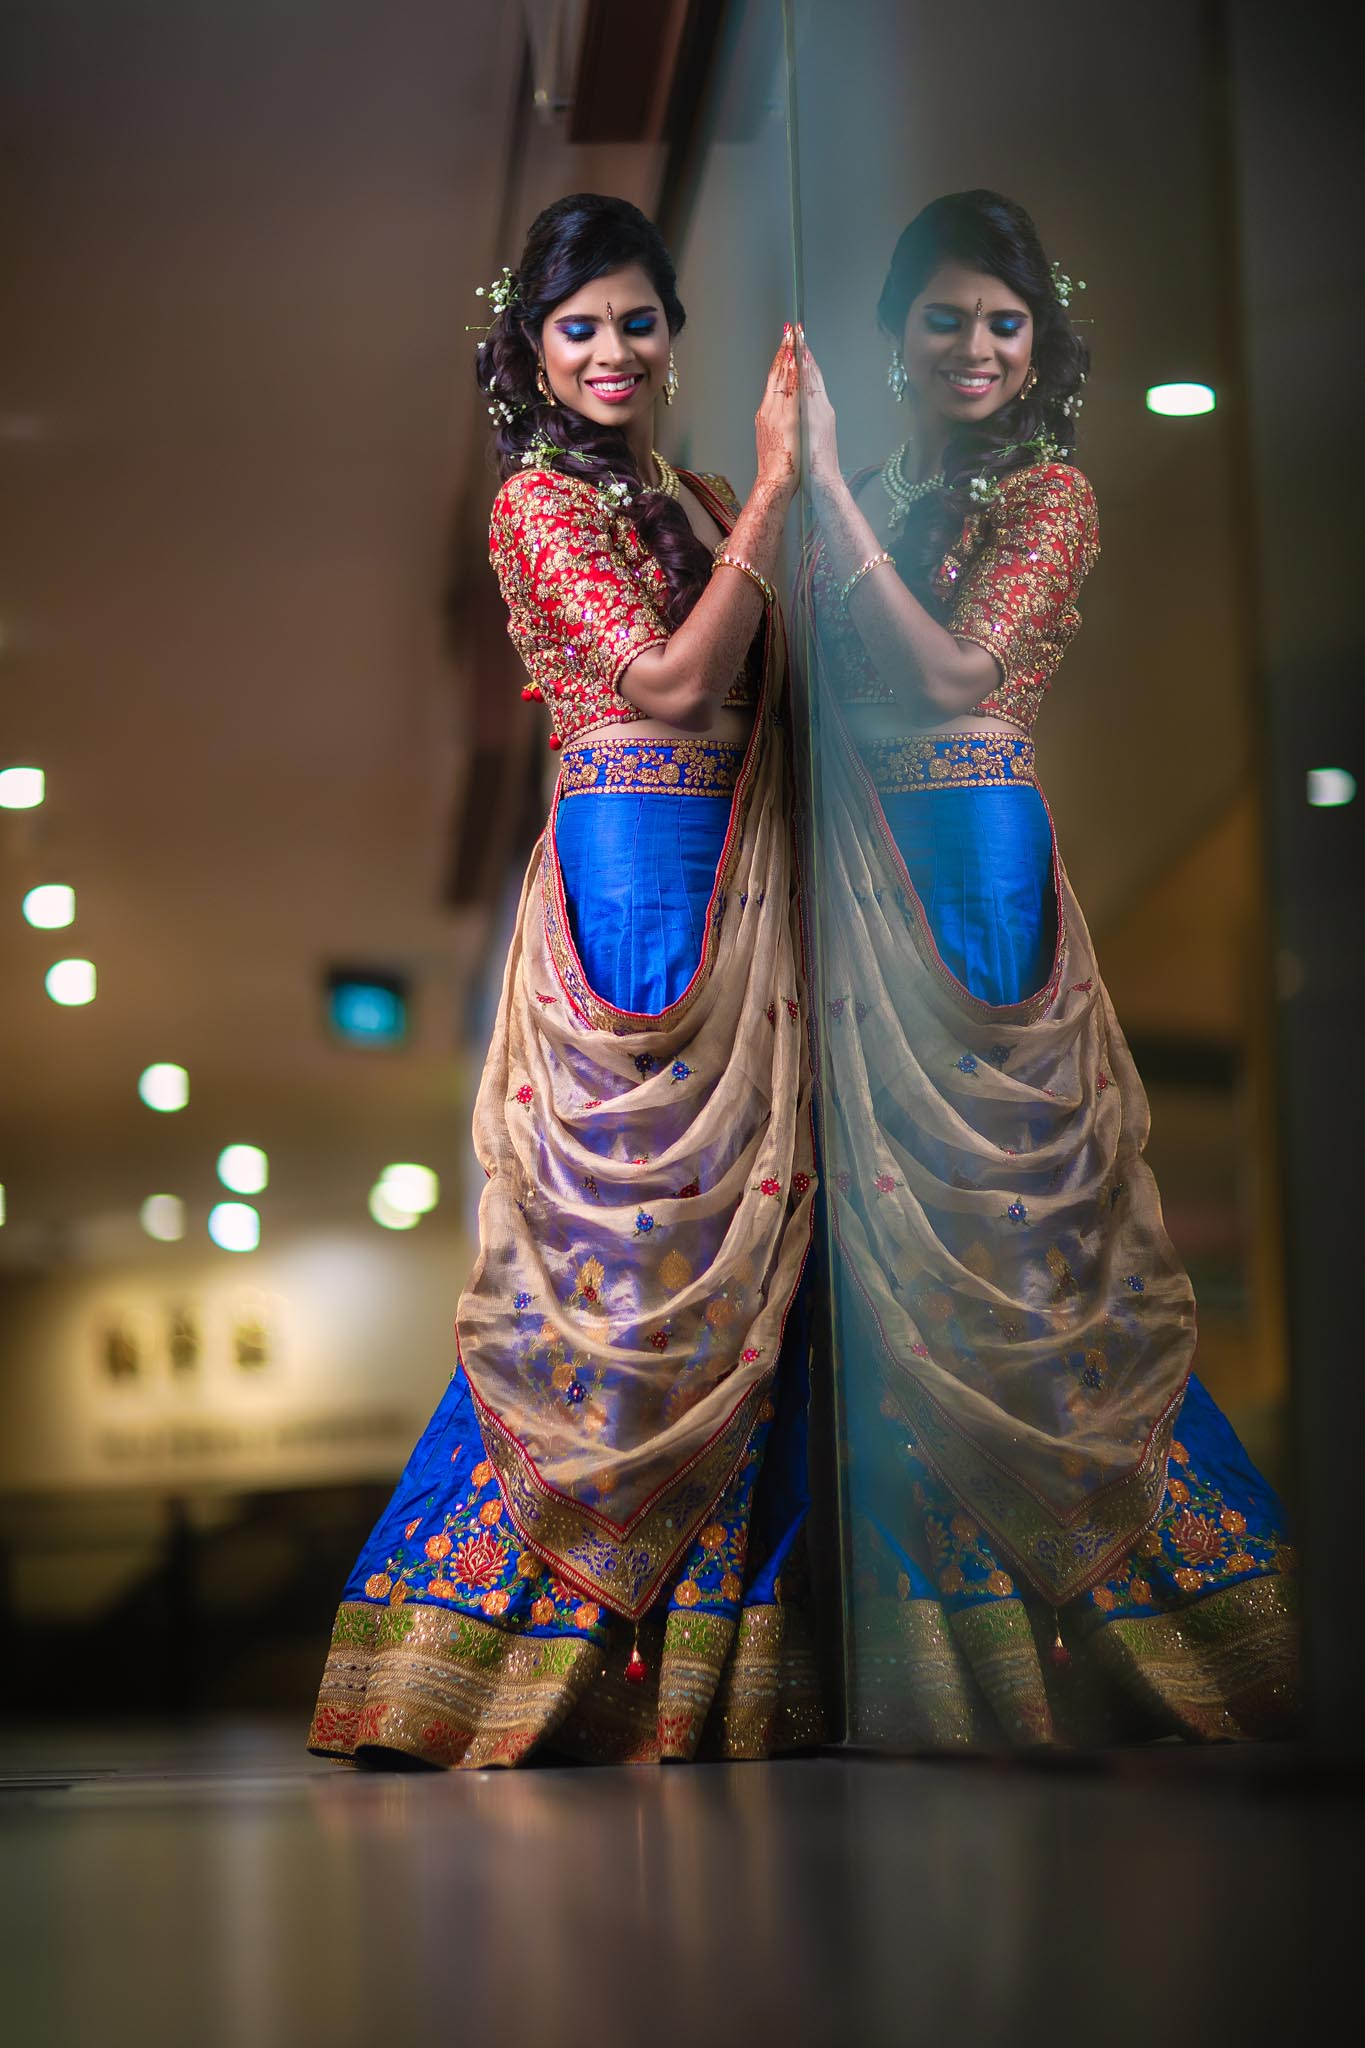 Best-of-2018-wedding-photography-focuz-studios-20